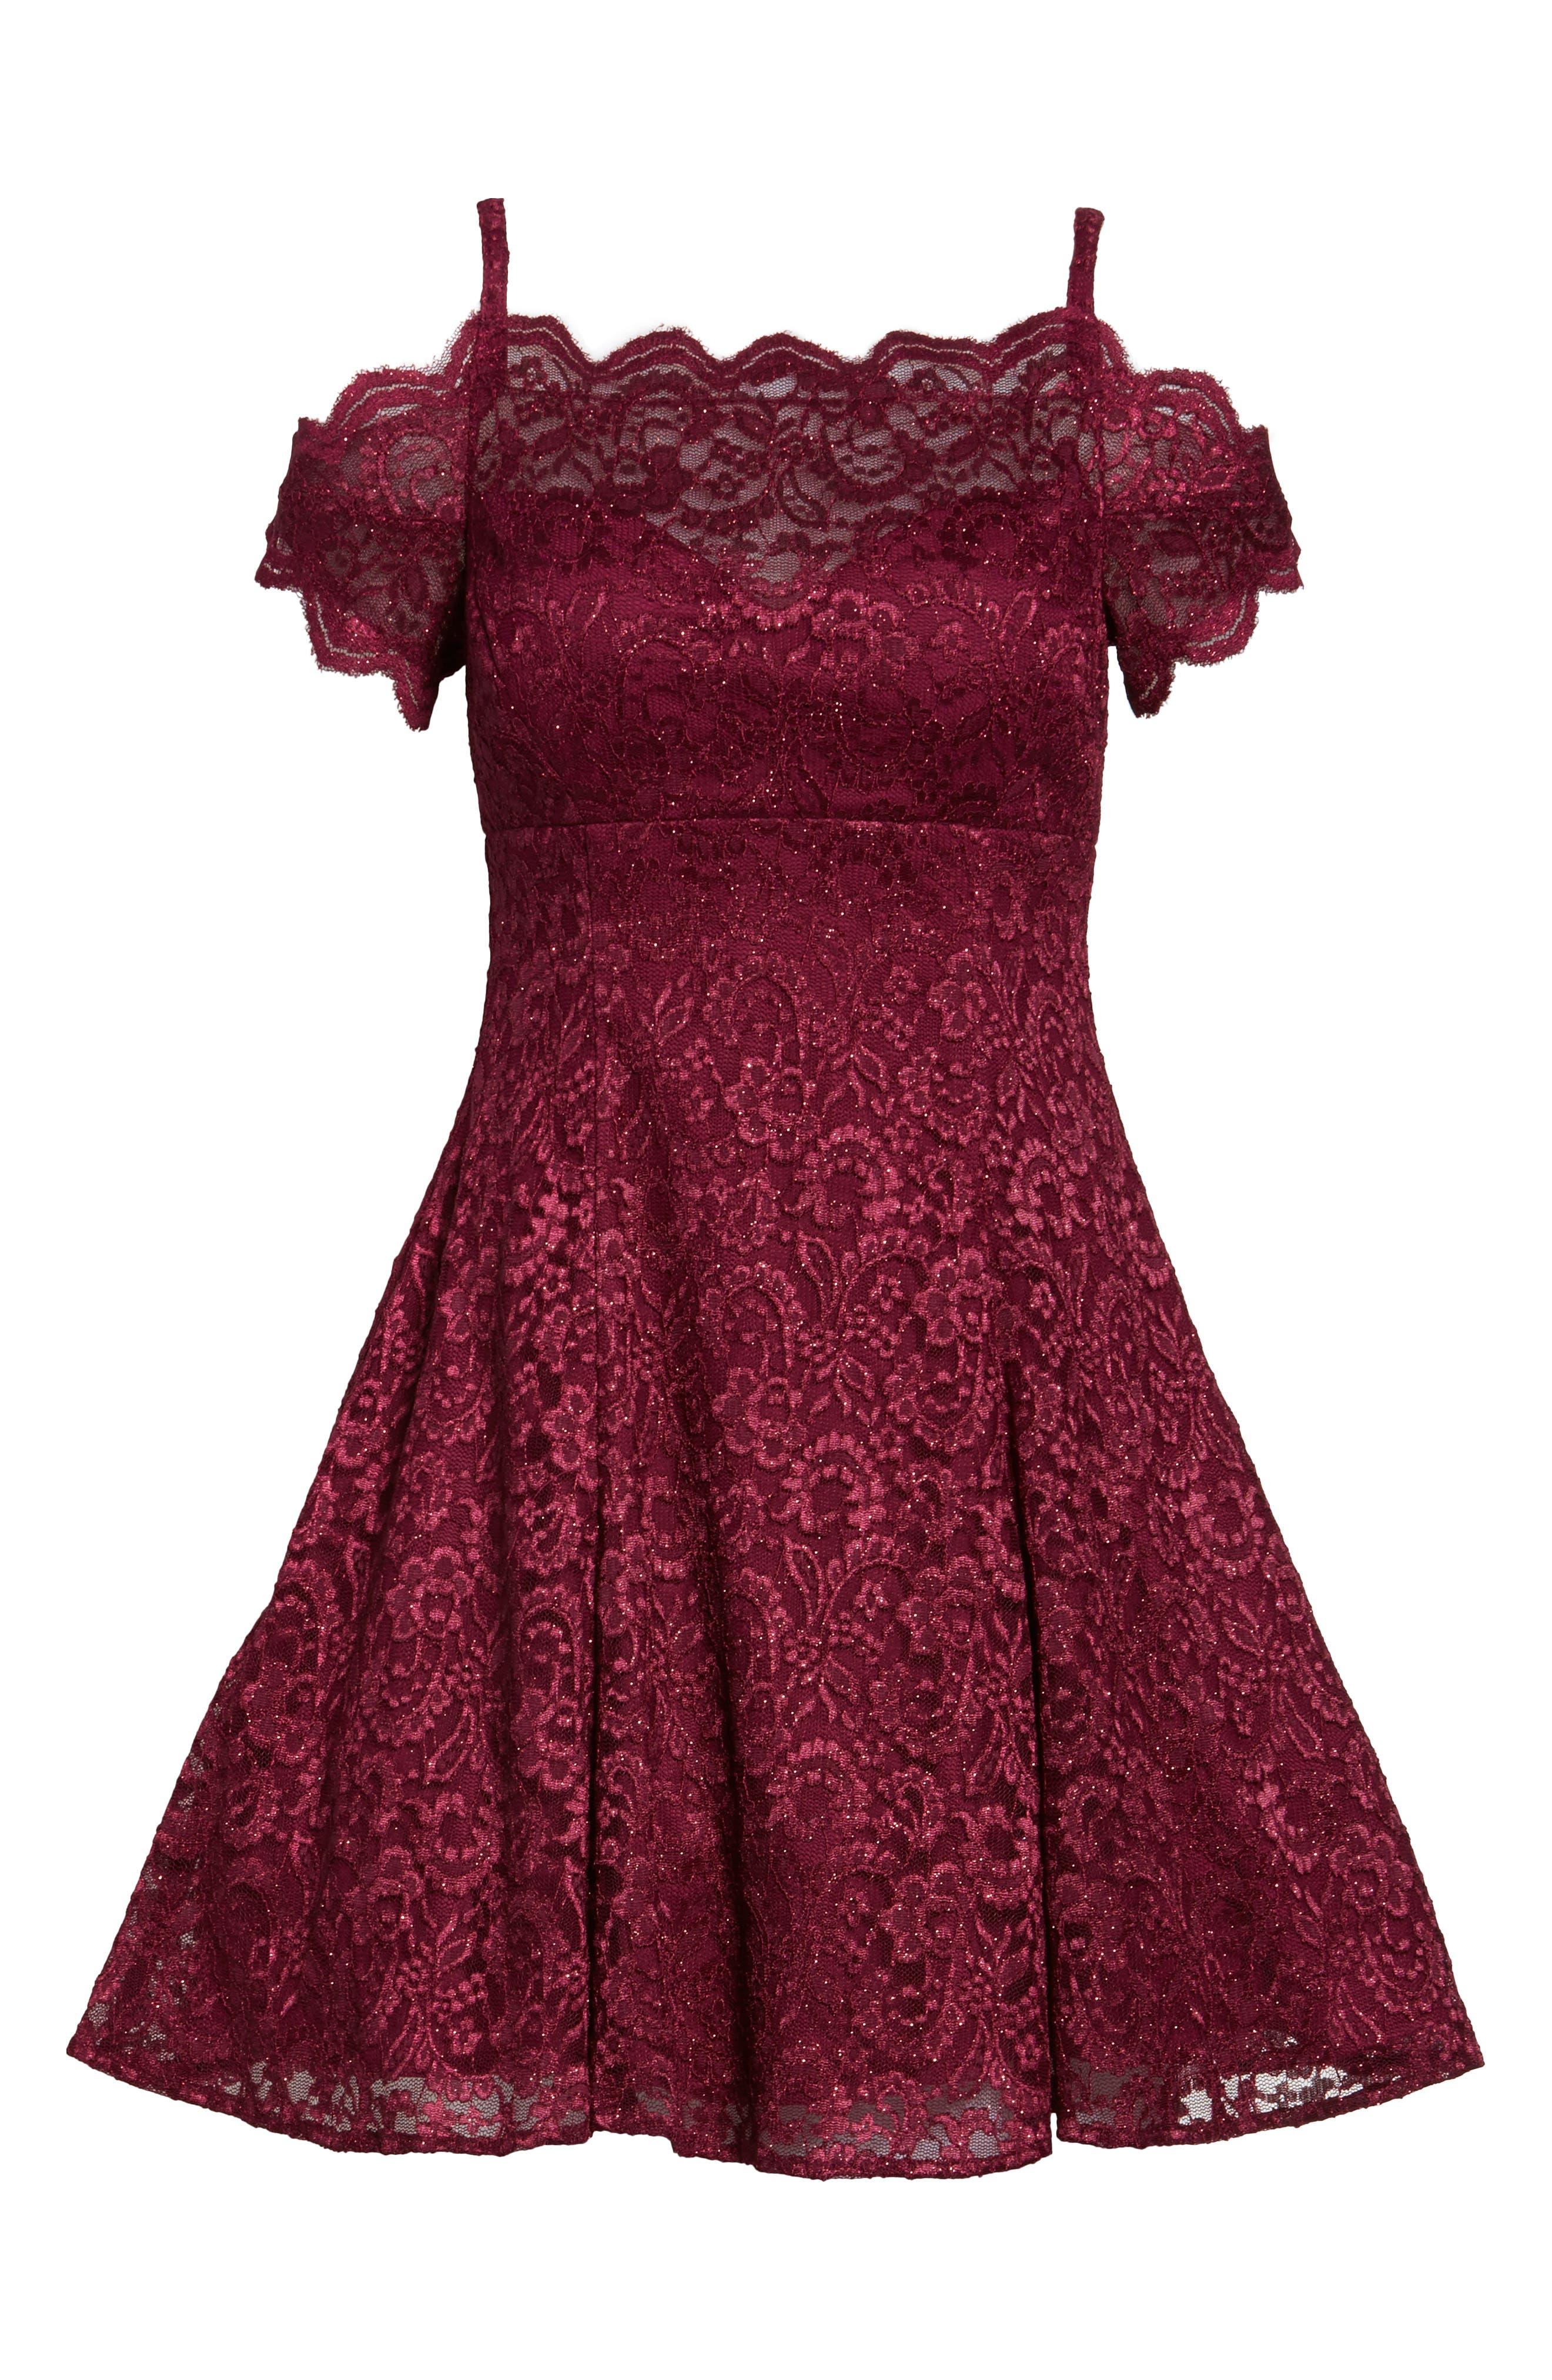 MORGAN & CO., Cold Shoulder Glitter Lace Fit & Flare Dress, Alternate thumbnail 7, color, MERLOT